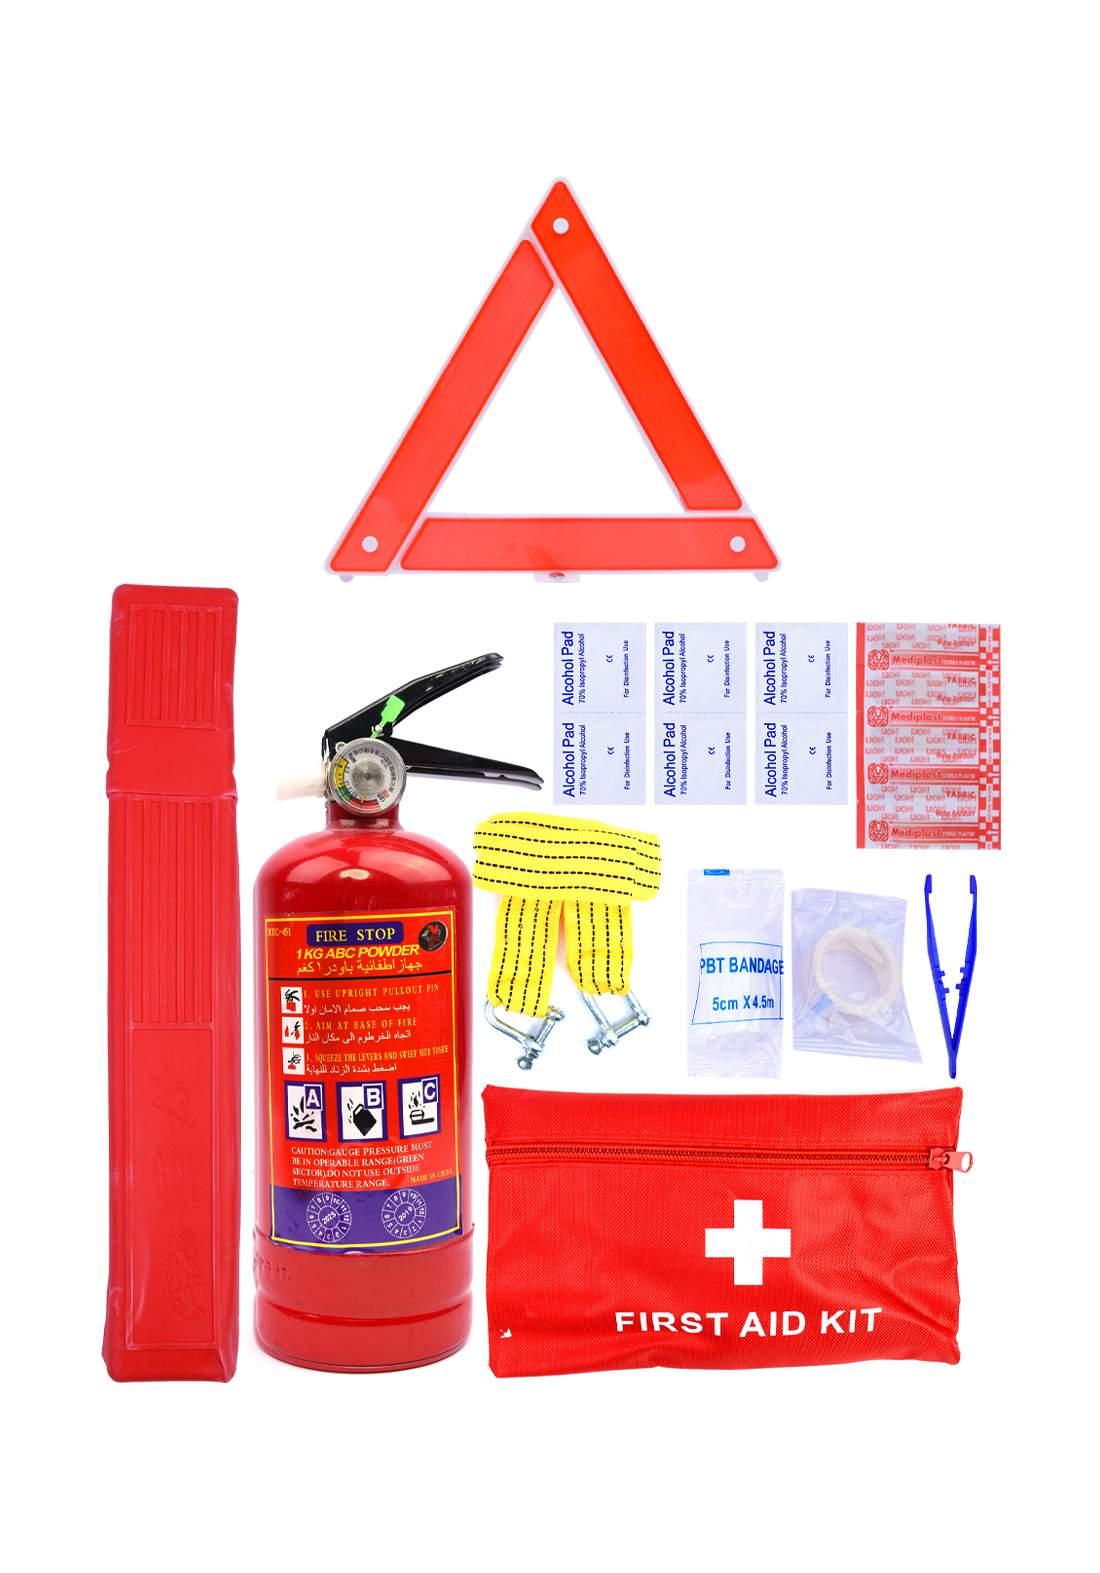 سيت طفاية حريق للسيارة  Set fire extinguisher for car